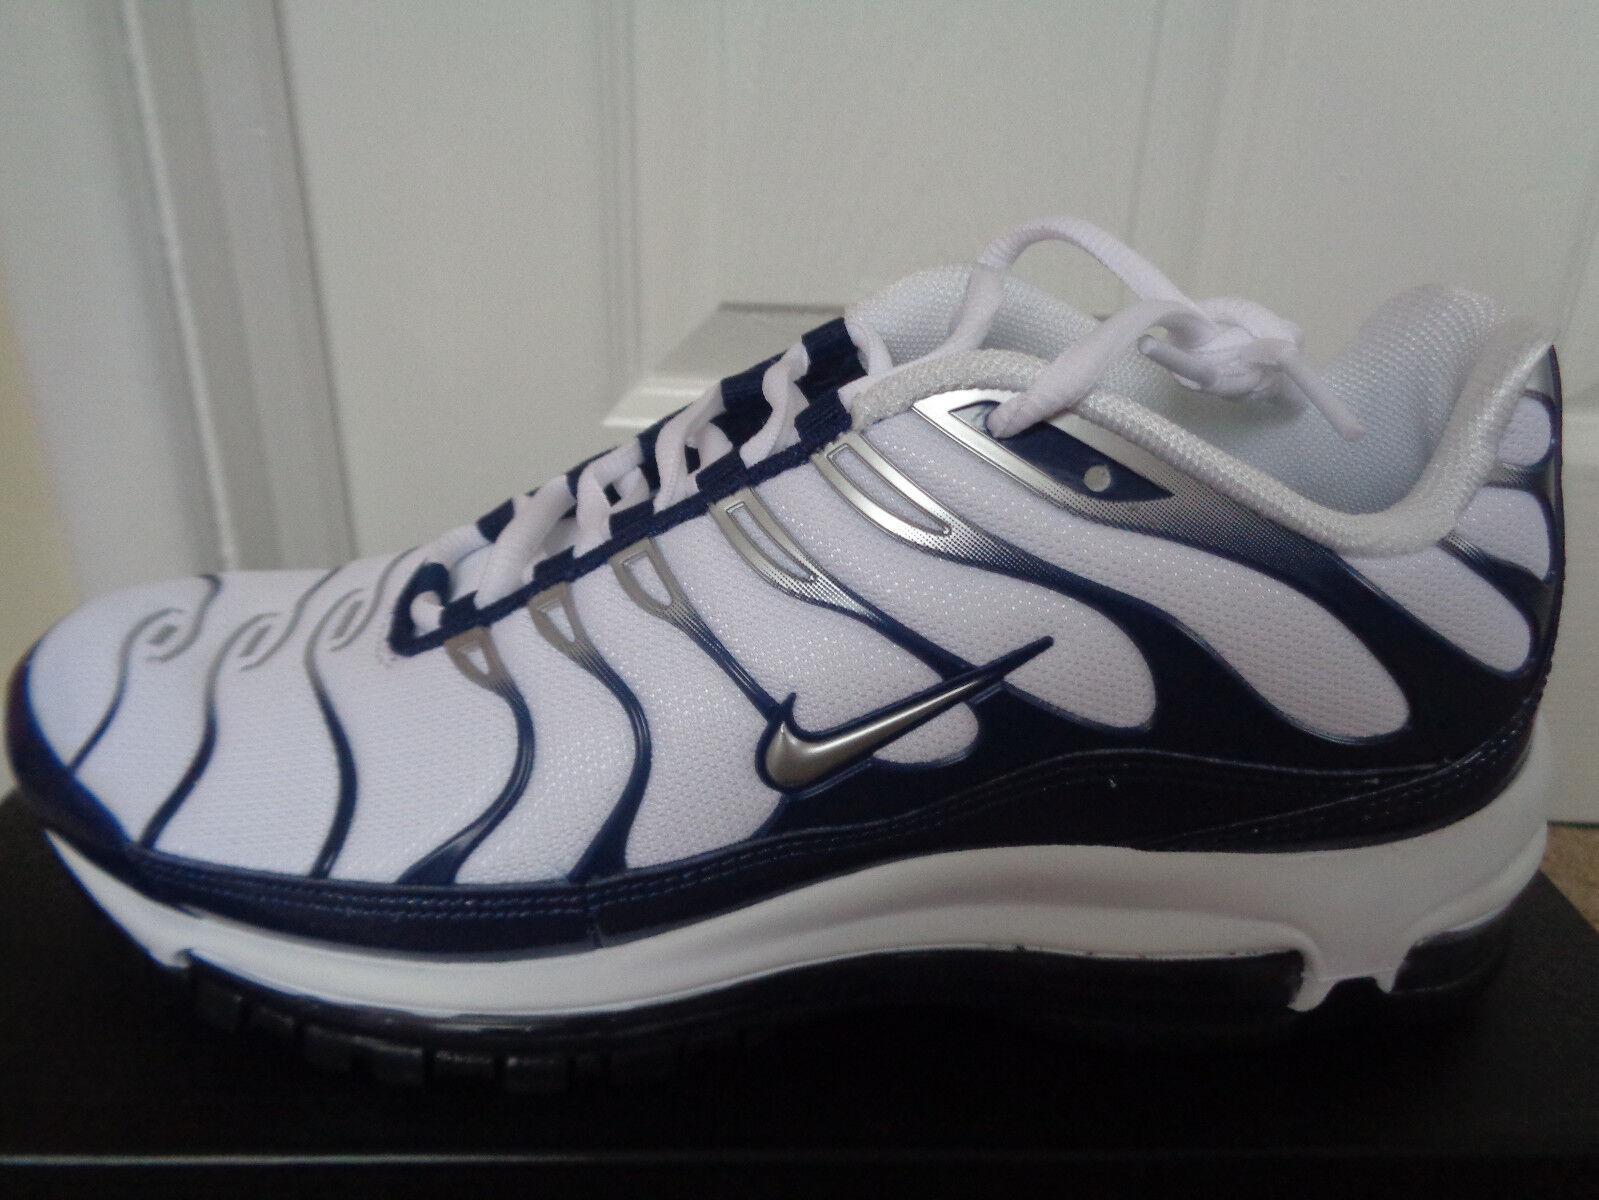 Nike Air max 97   plus trainers schuhe AH8144 100 uk 8.5 eu 43 us 9.5 NEW+BOX